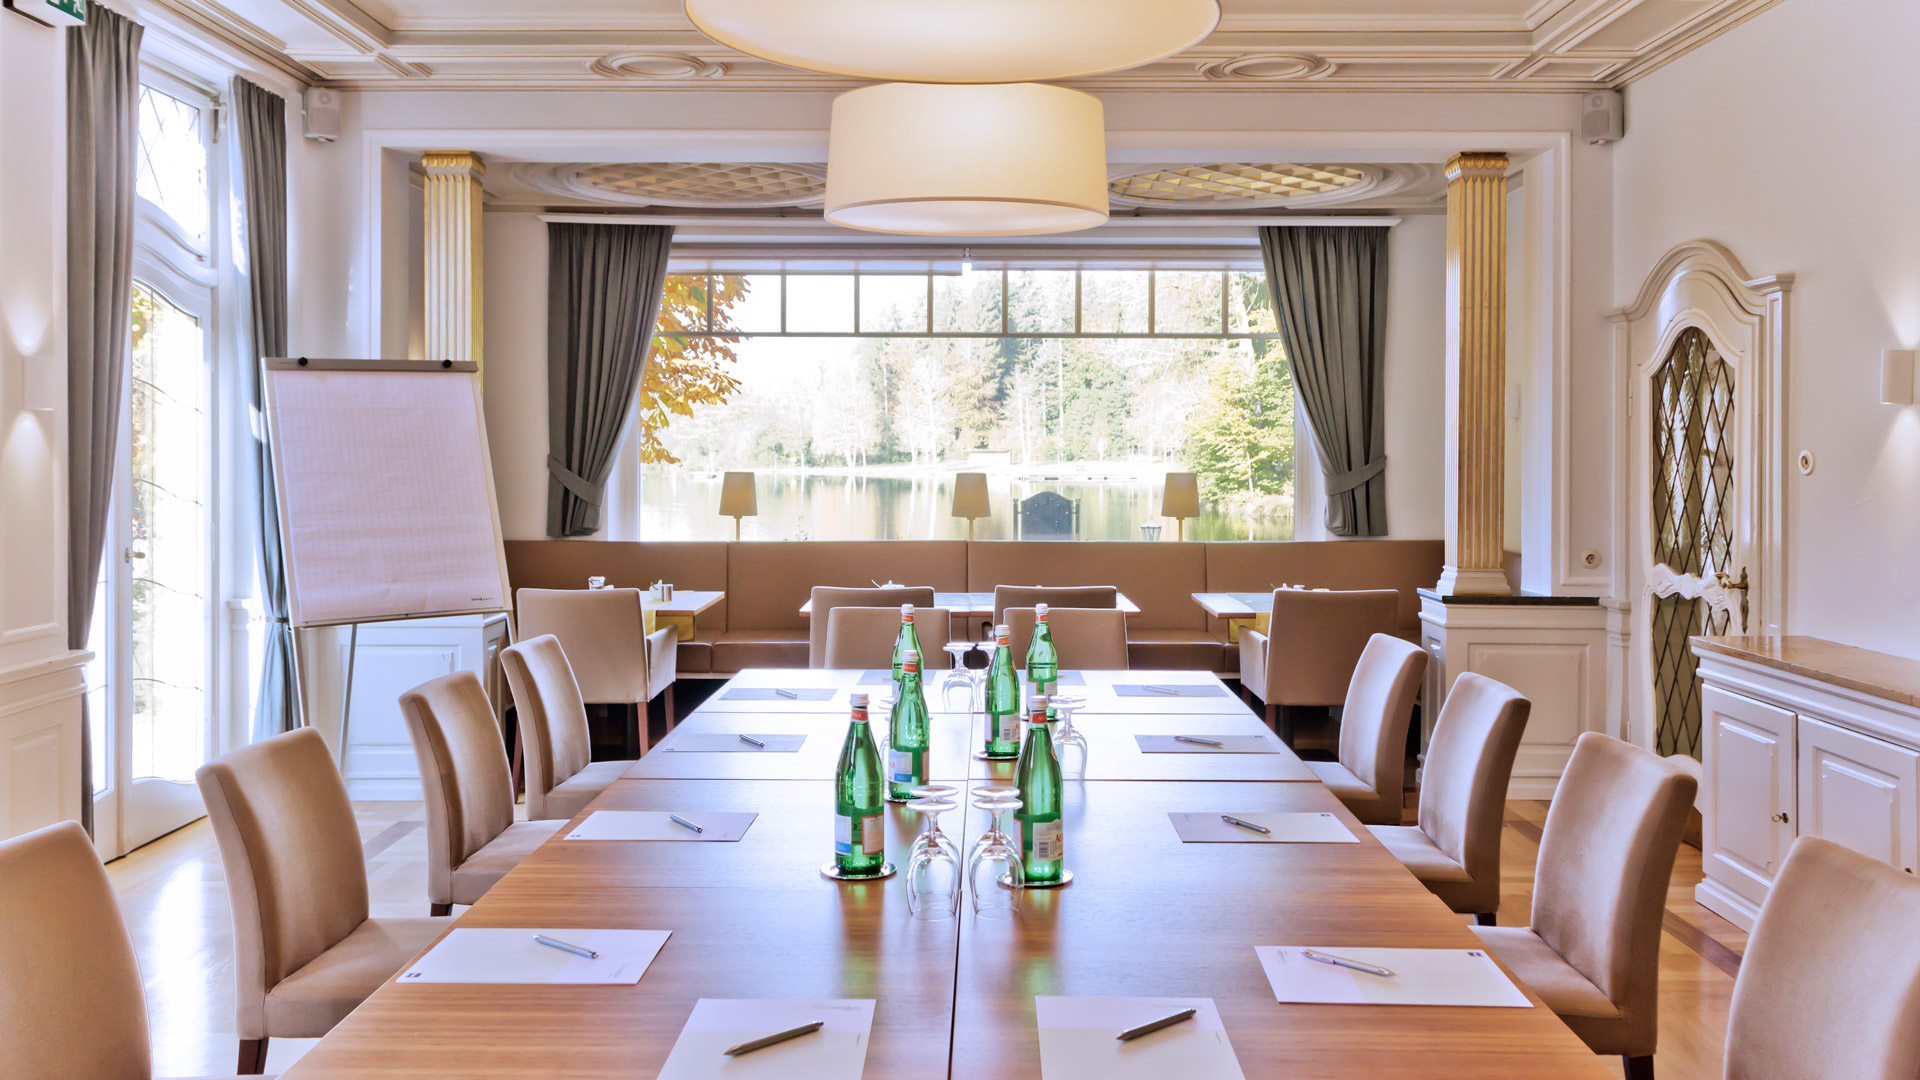 Besprechung Tagung Hotel Waldsee Banner